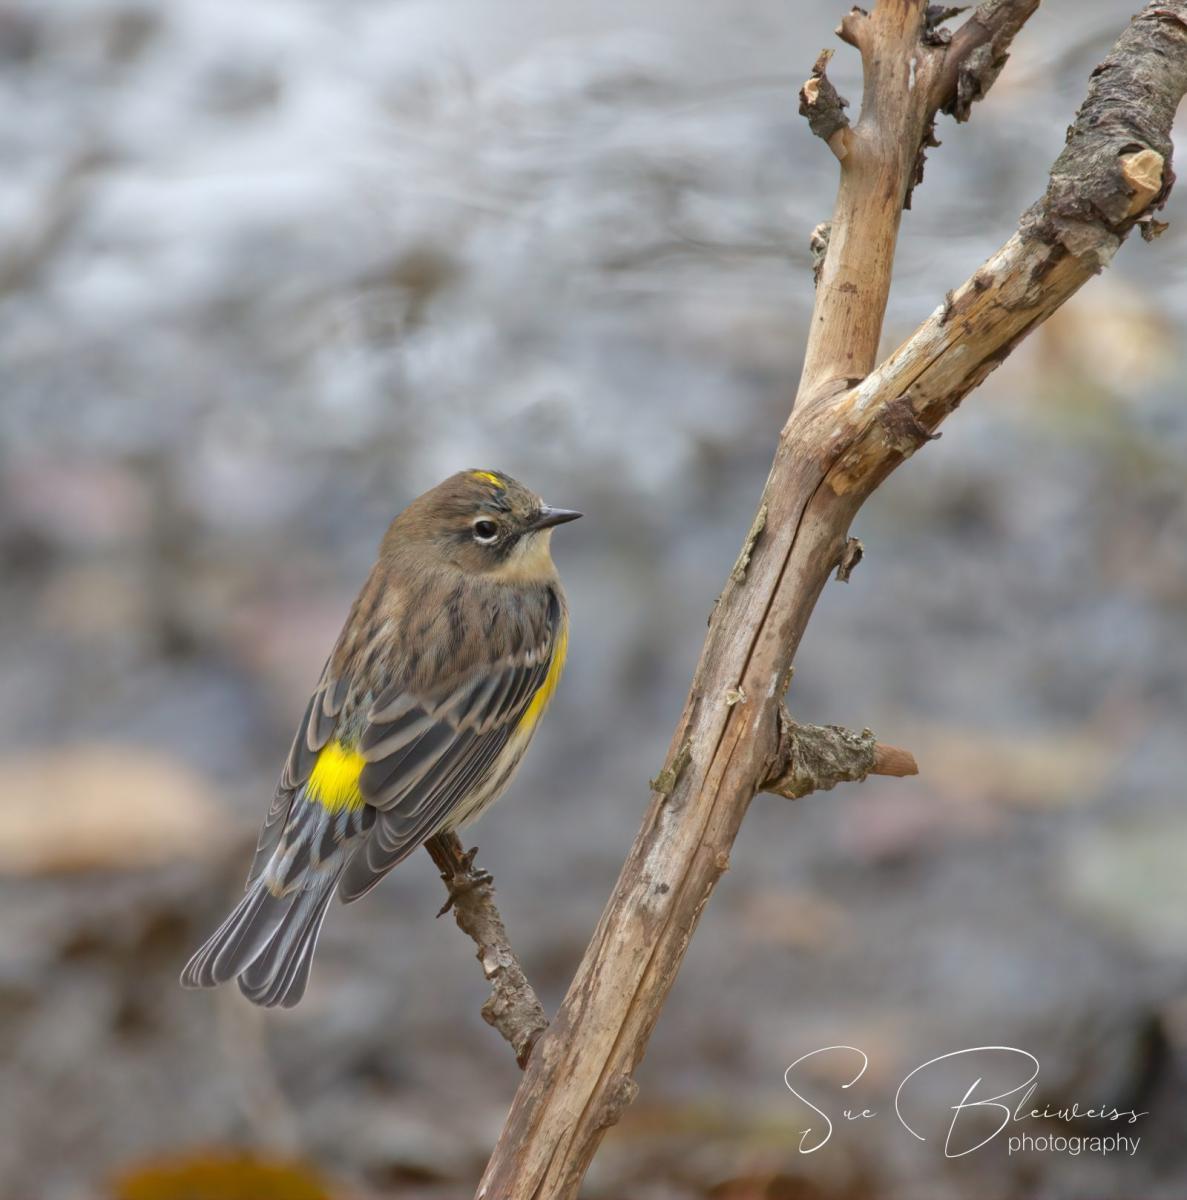 Yellow-rumped Warbler by Susan Bleiweiss